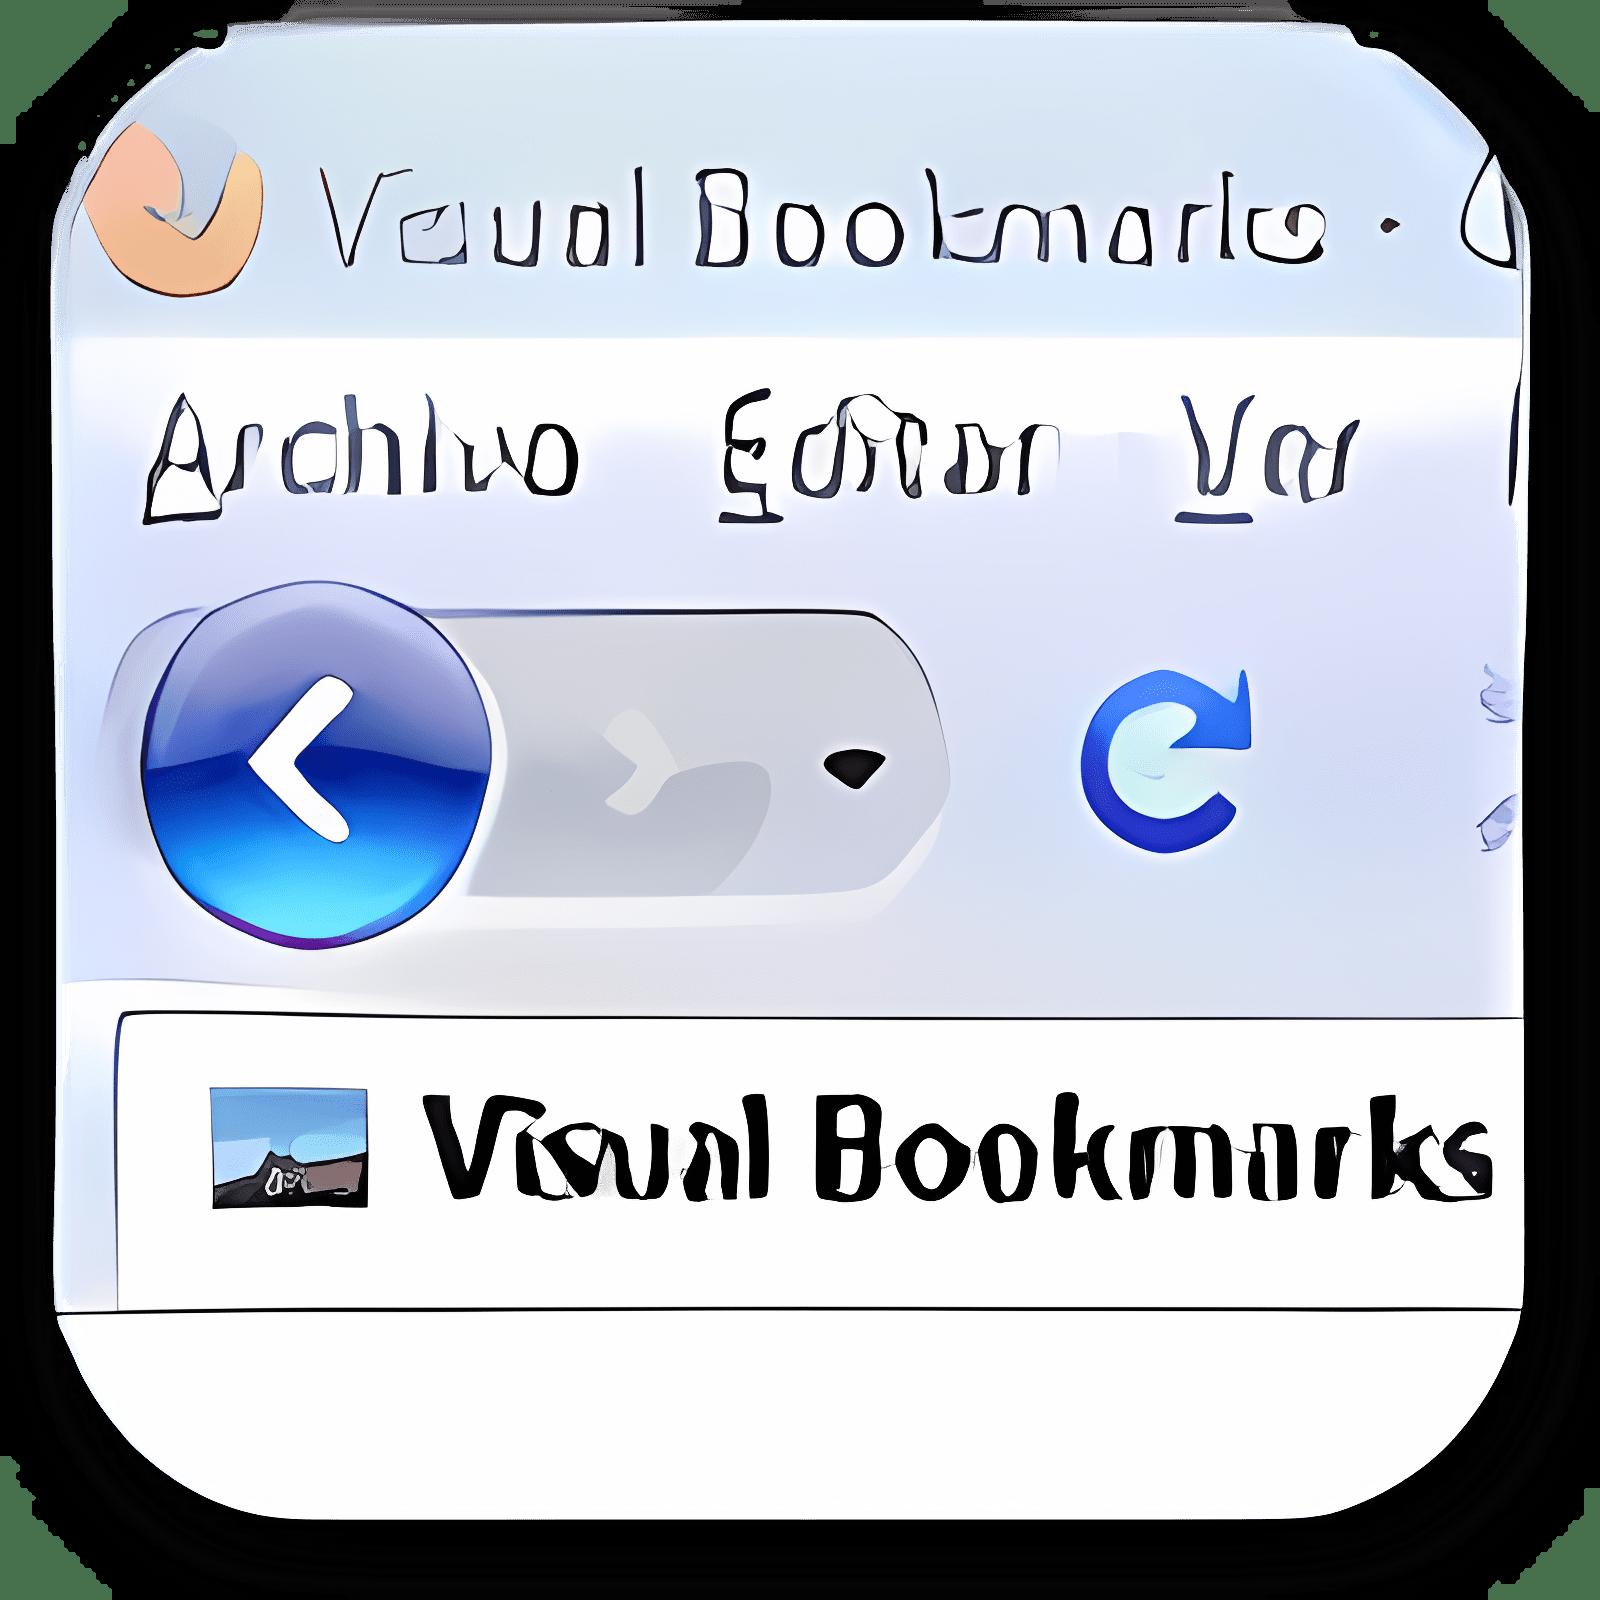 Visual Bookmarks